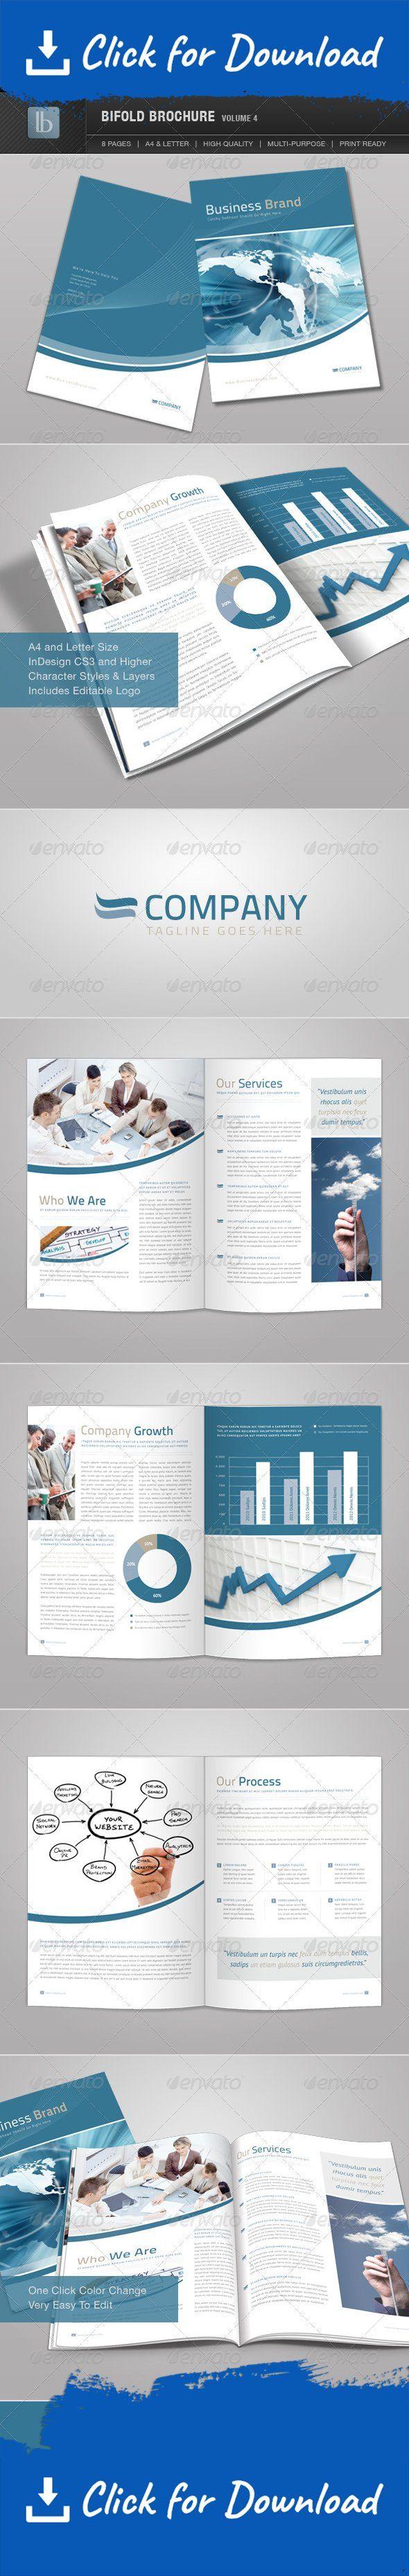 33 best Elegant Brochures images on Pinterest | Brochures, Brochure ...